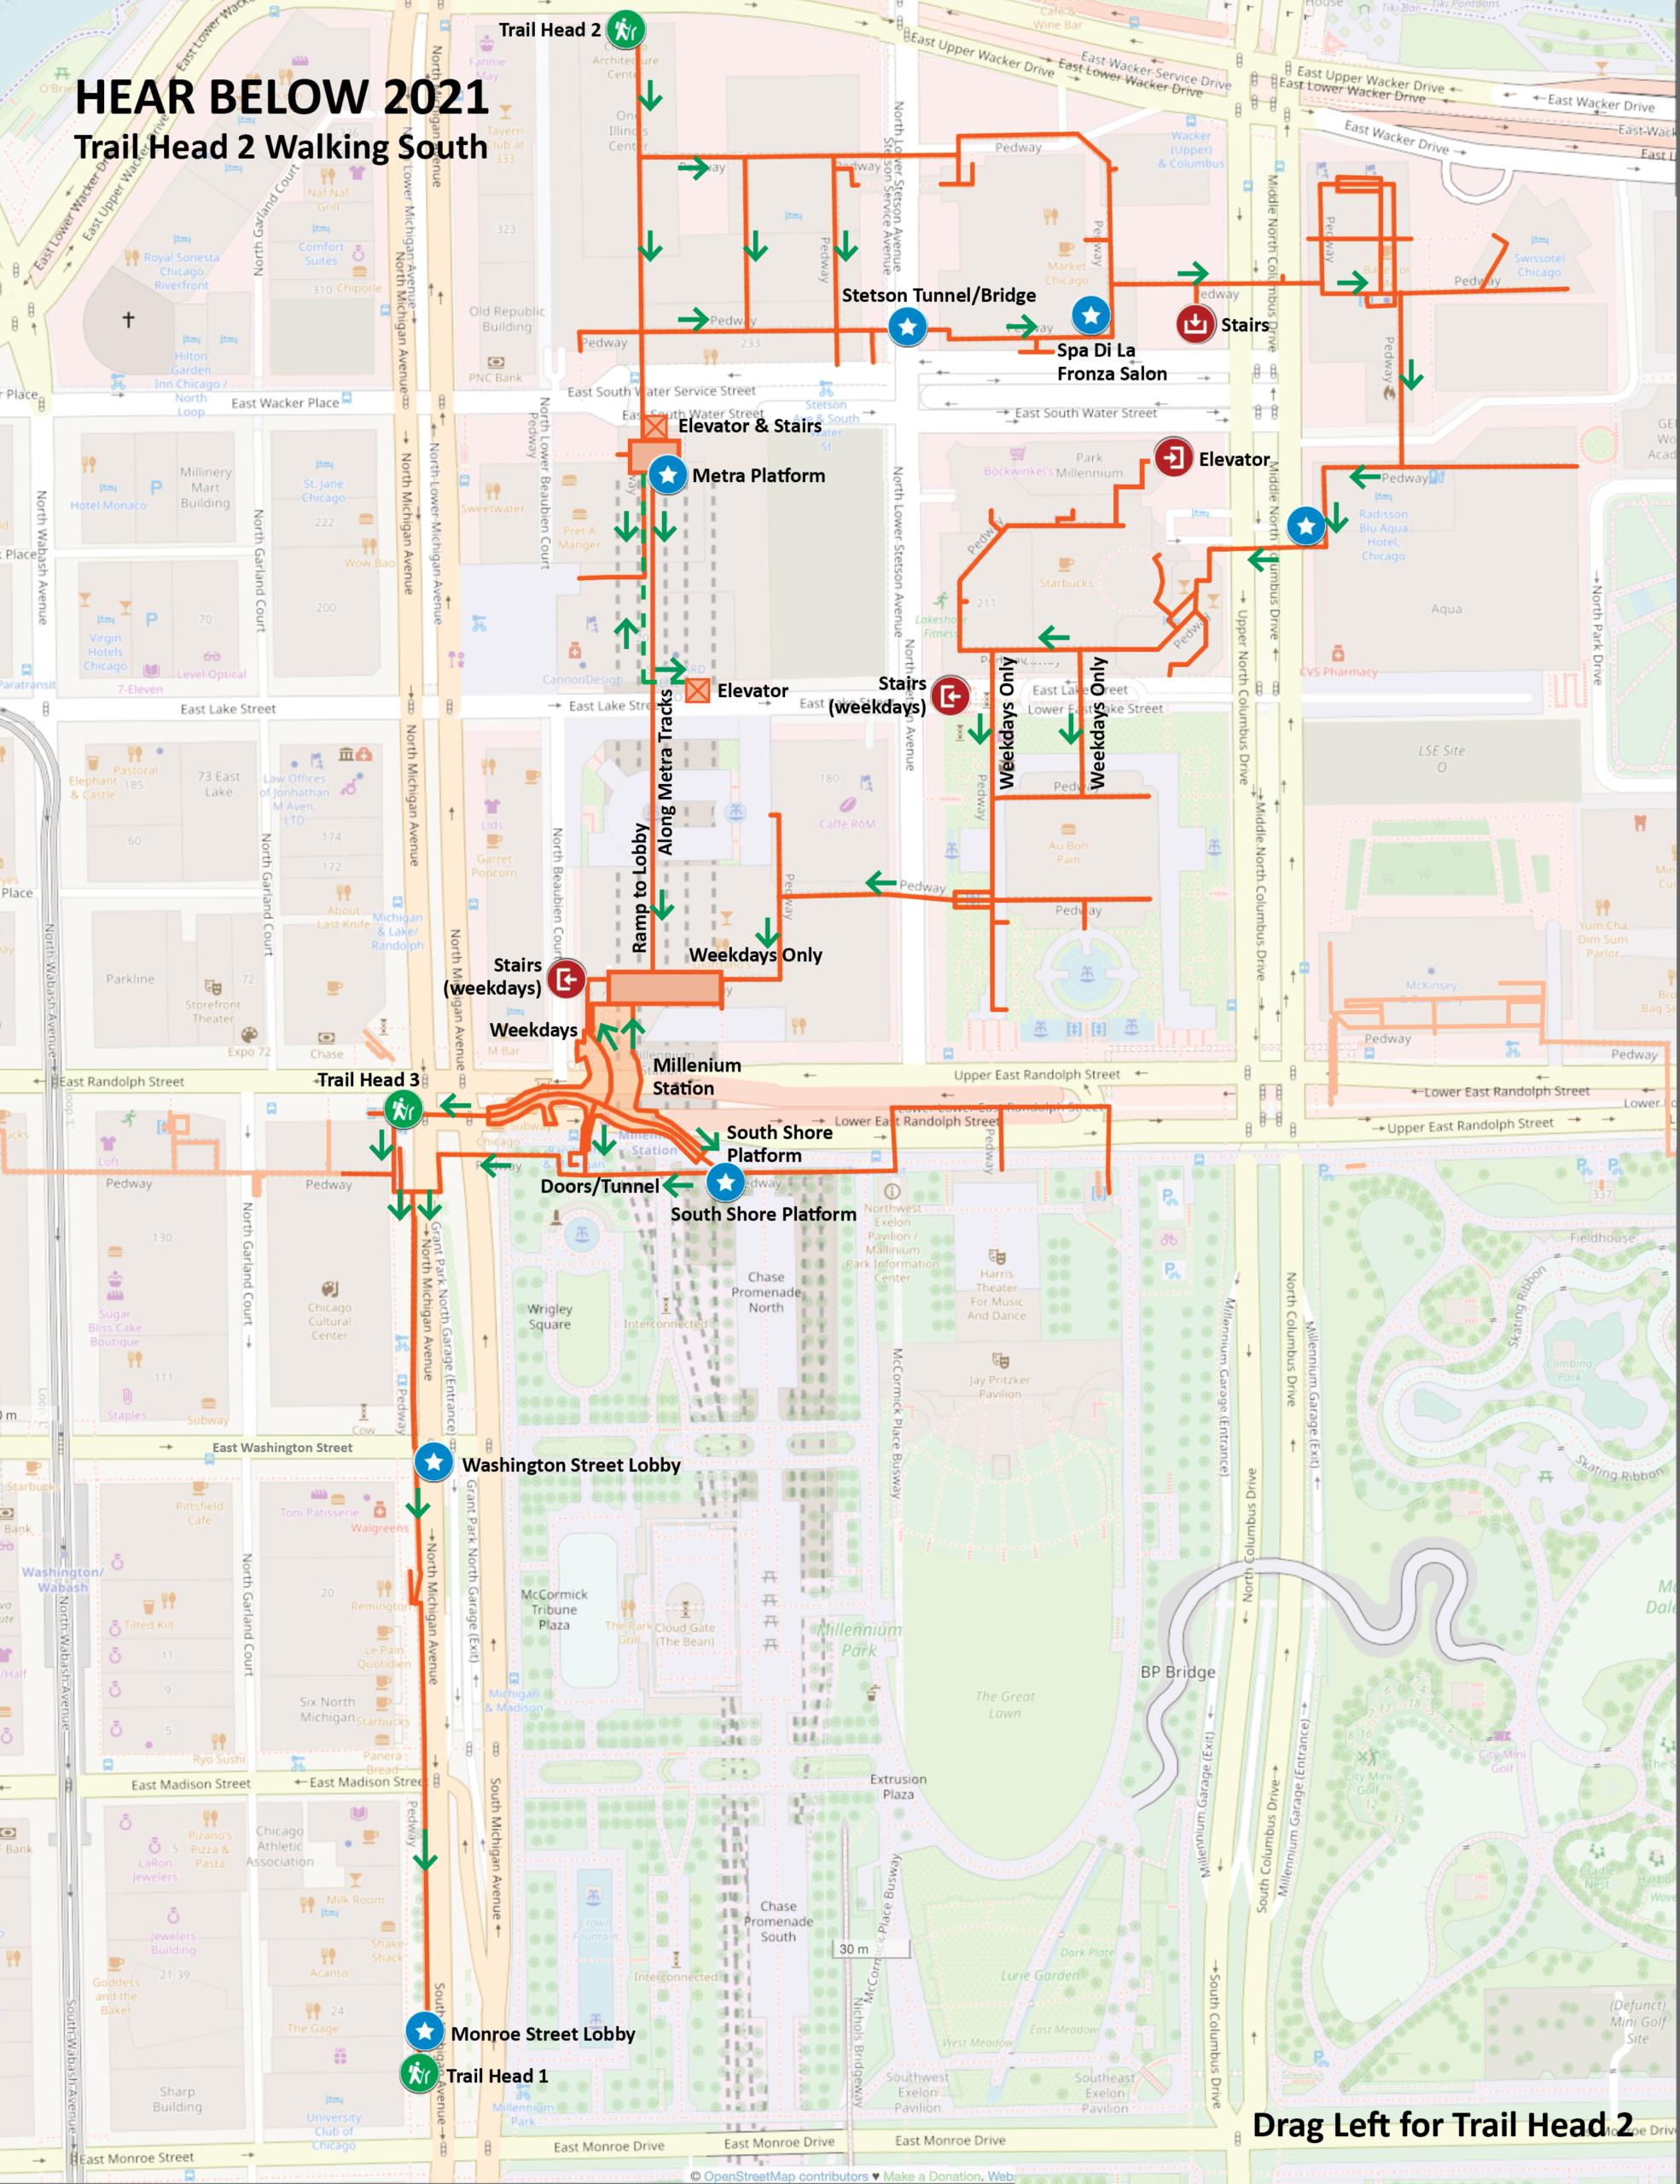 HB Trail Head 2 Map